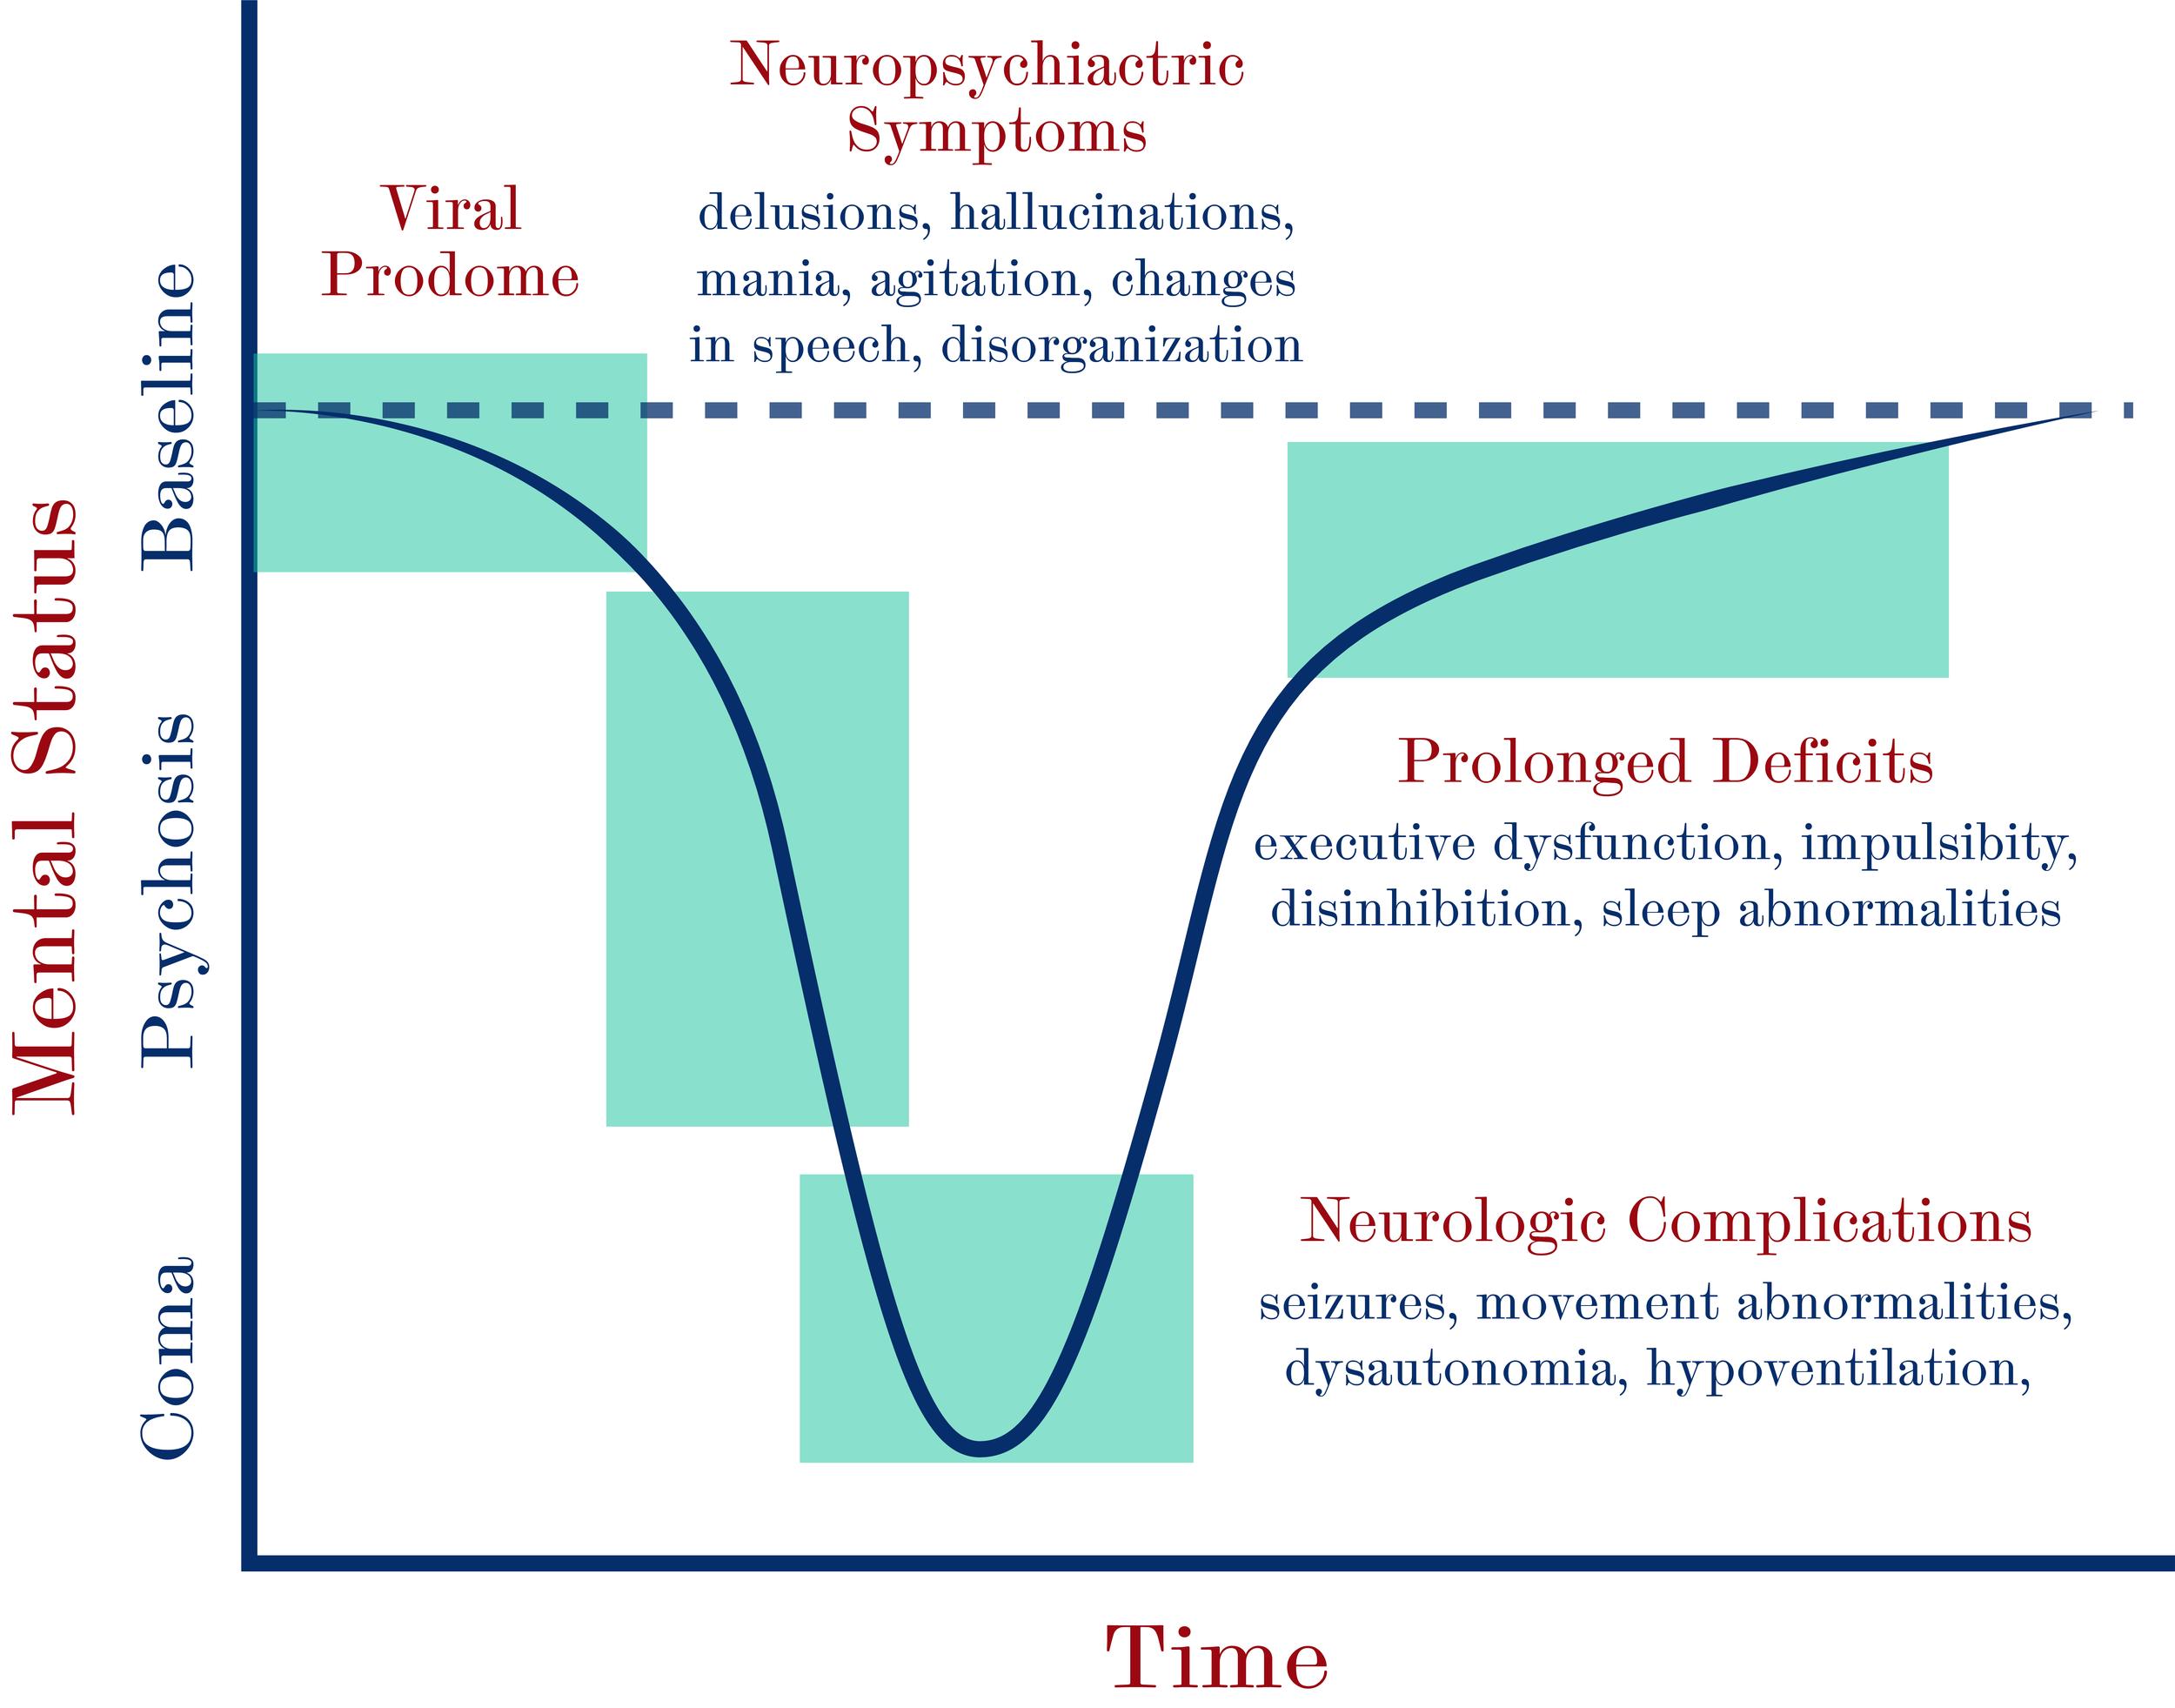 Figure 1 : Four phases of illness in anti-NMDA receptor encephalitis.